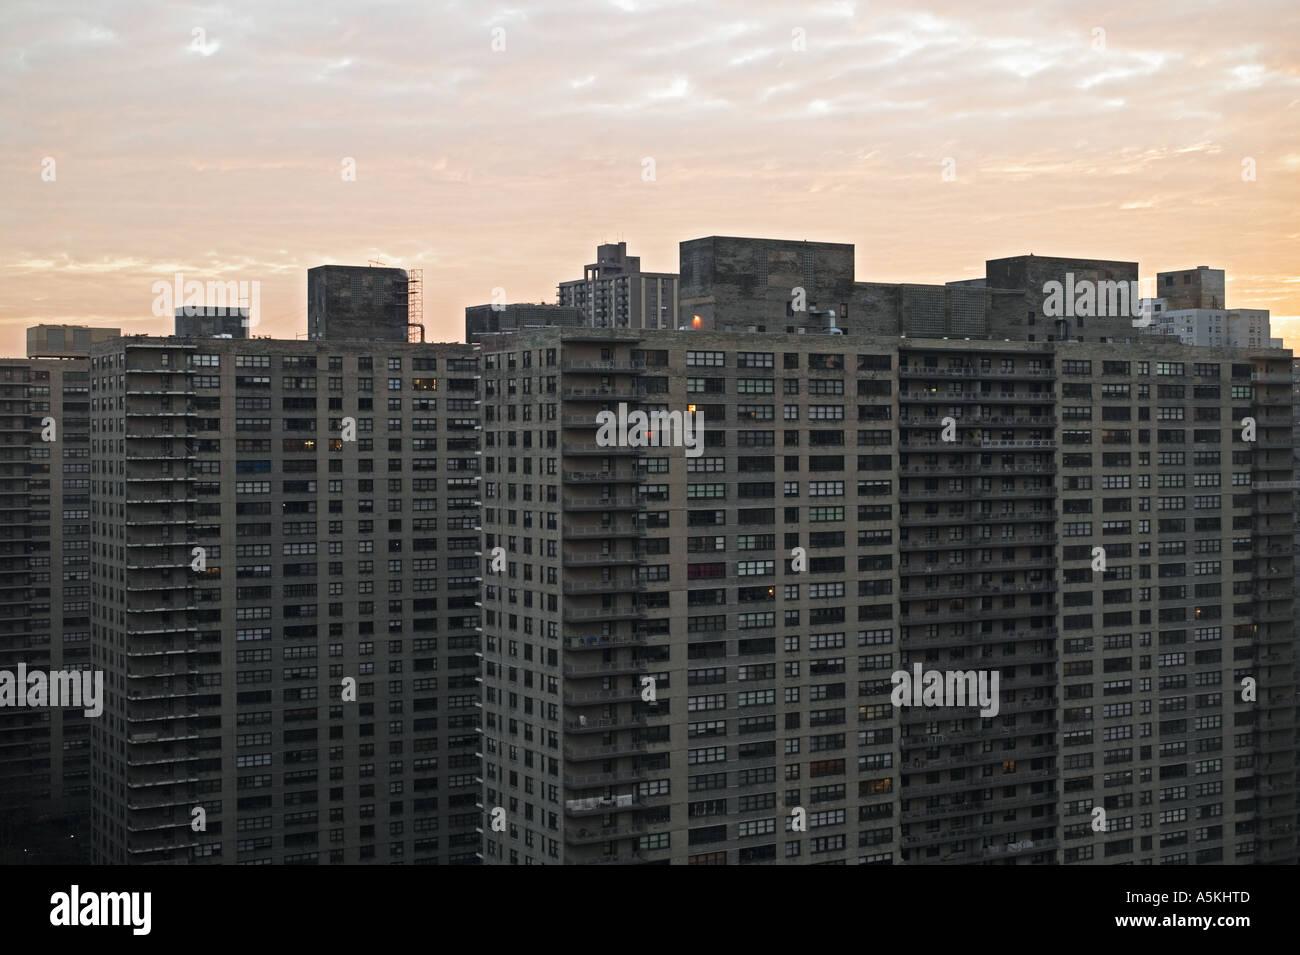 High Rise Apartment Building At Sunrise Manhattan New York City - Stock Image